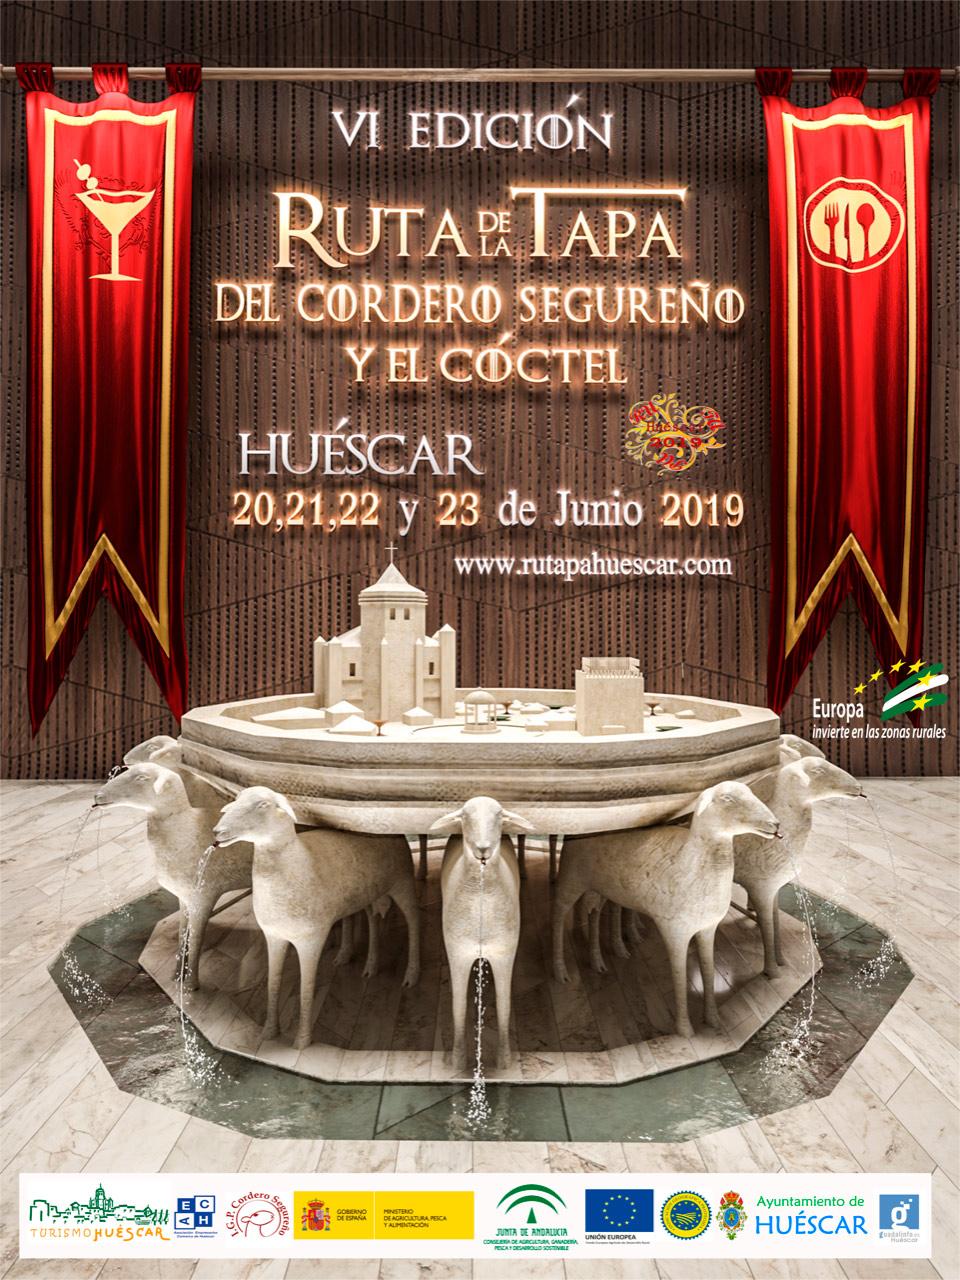 Cartel de la Ruta de la Tapa de Huescar junio de 2019